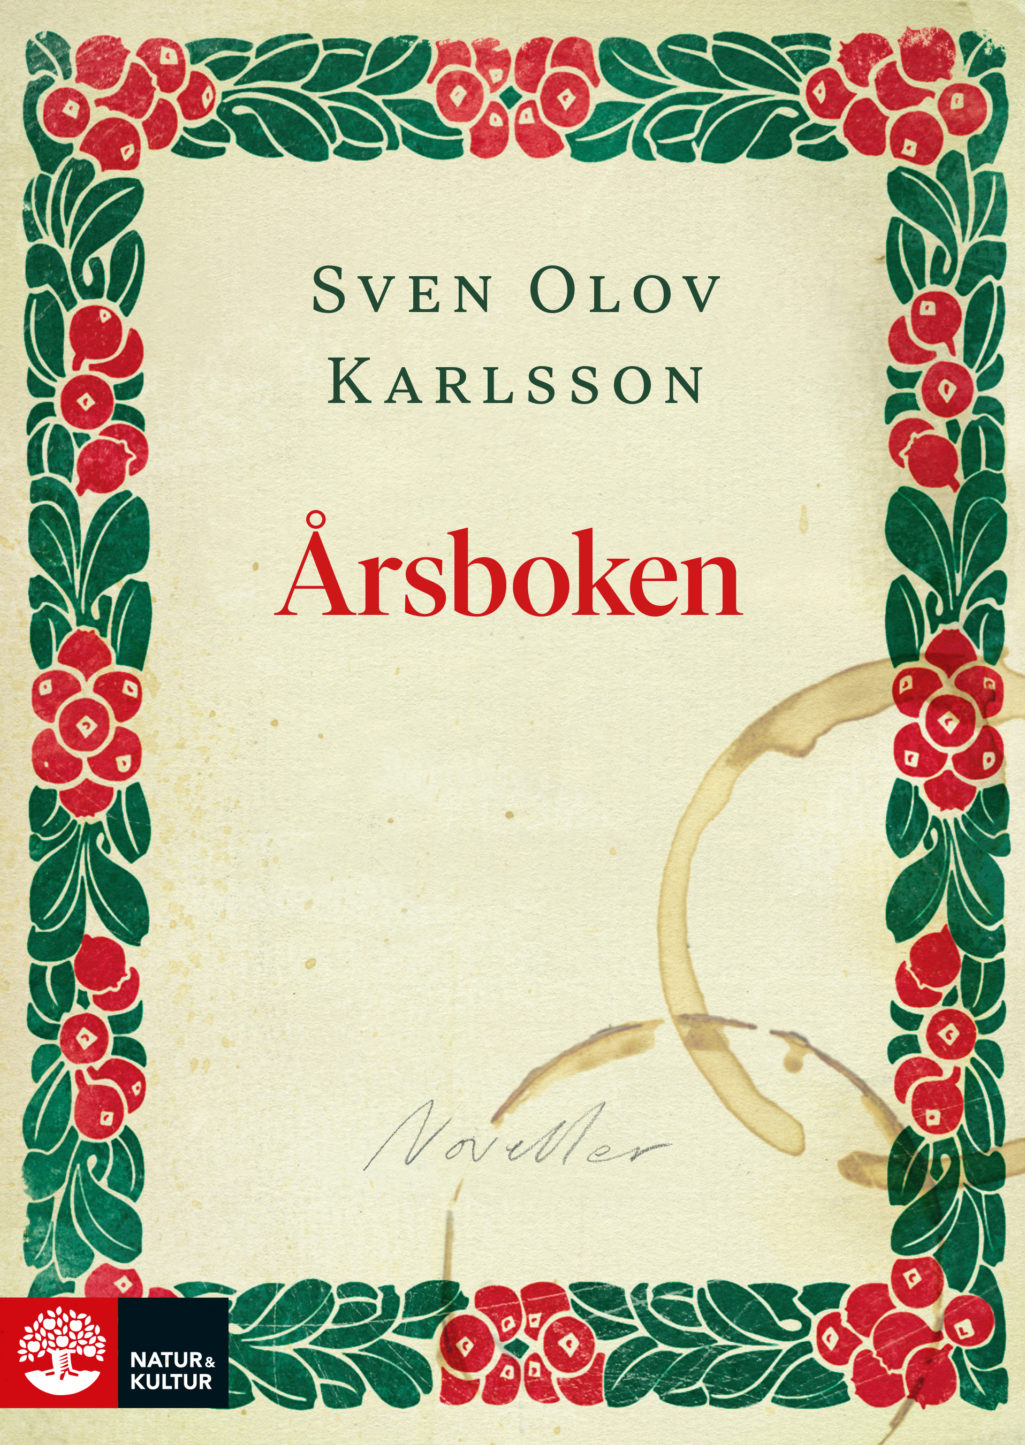 karlsson_arsboken_ok